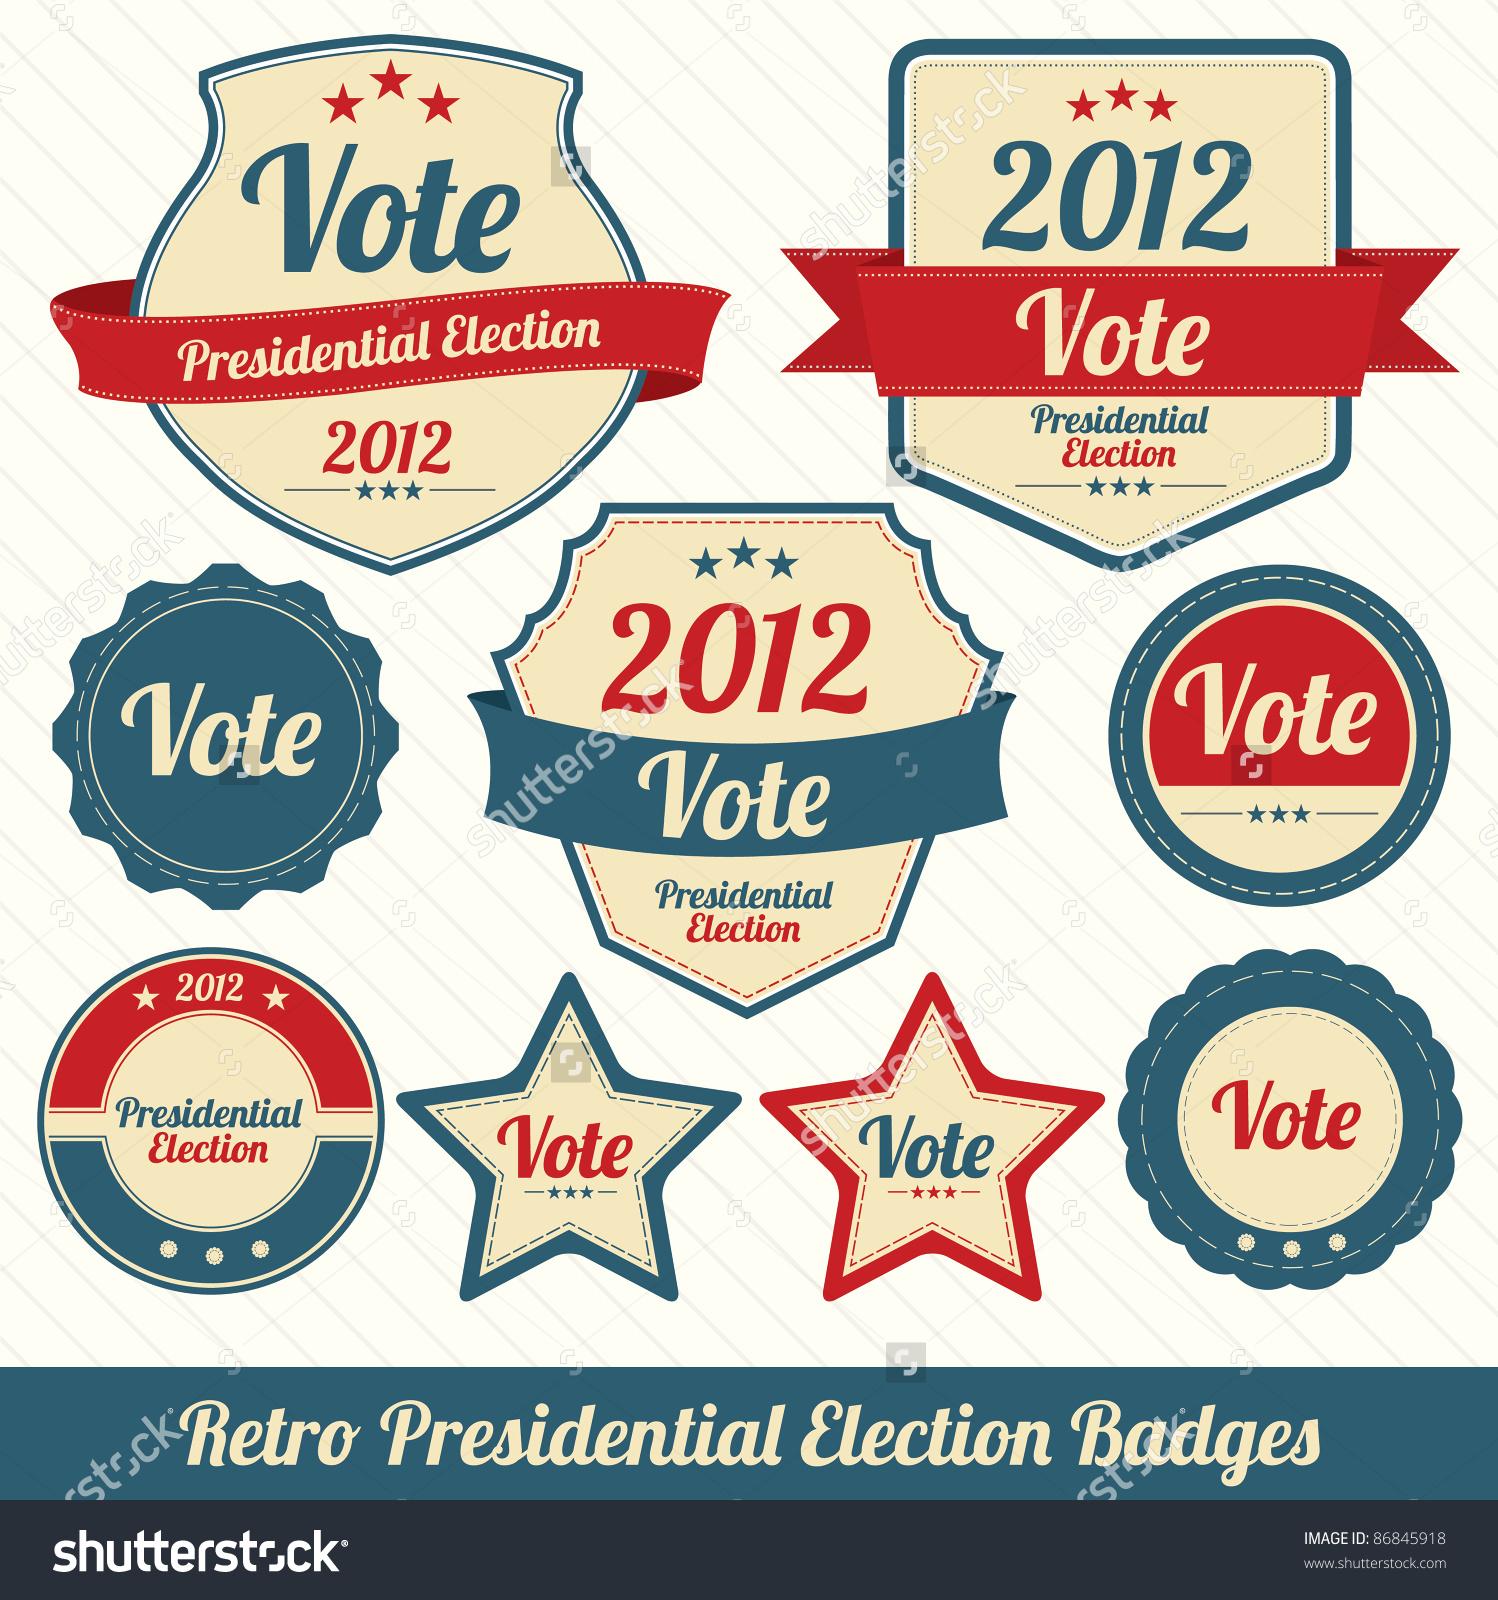 Retro Presidential Election.